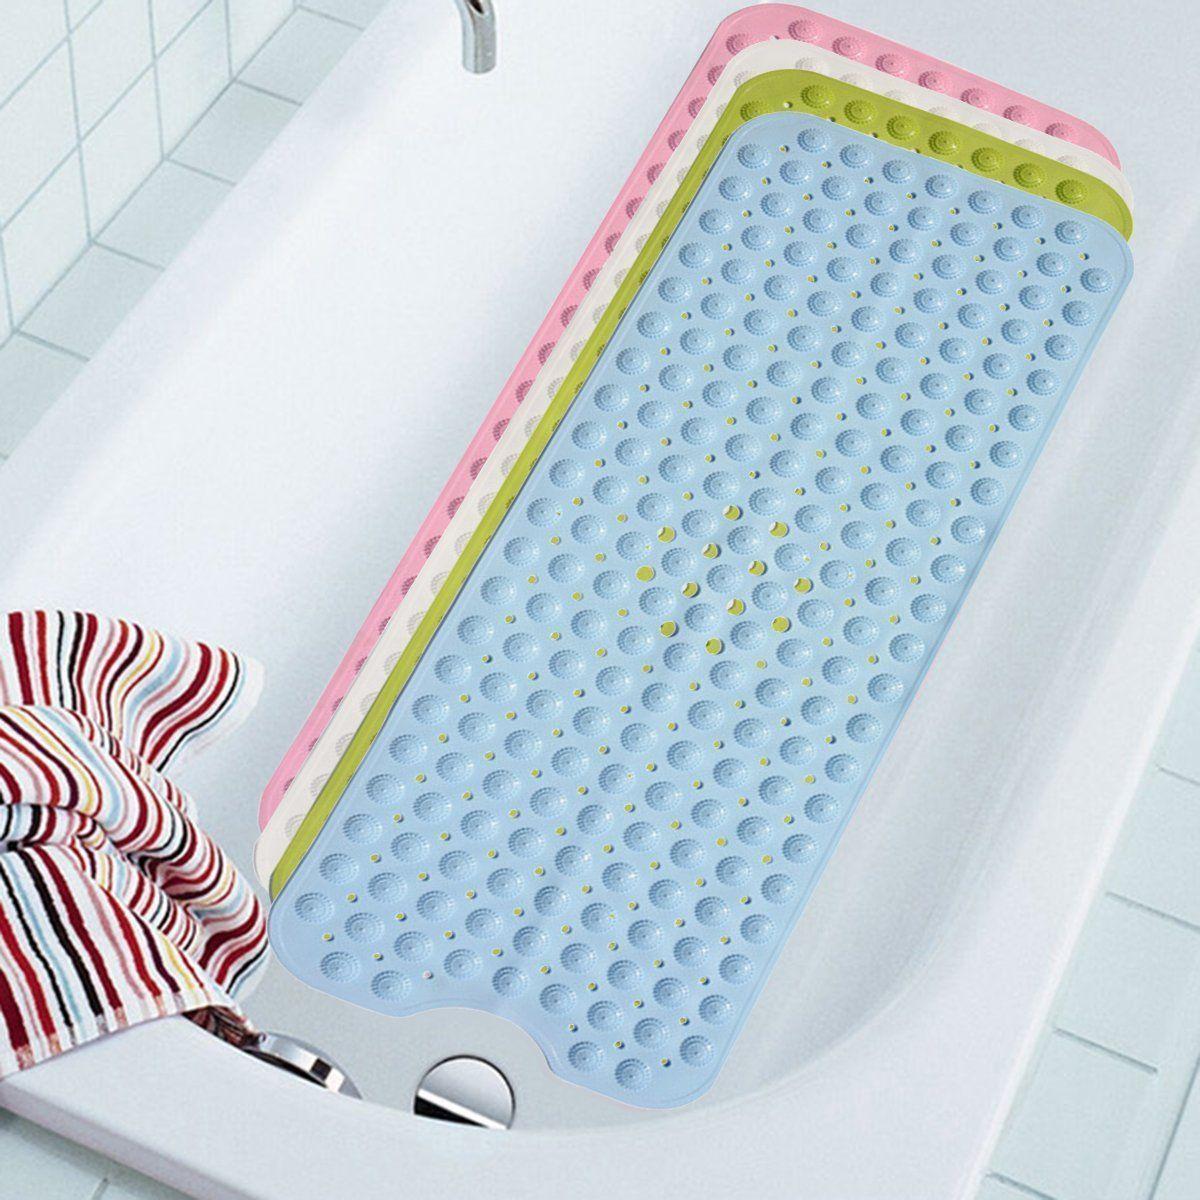 Antibacterial Cushioned Bath Tub Mat Non Anti Slip Safety Skid ...